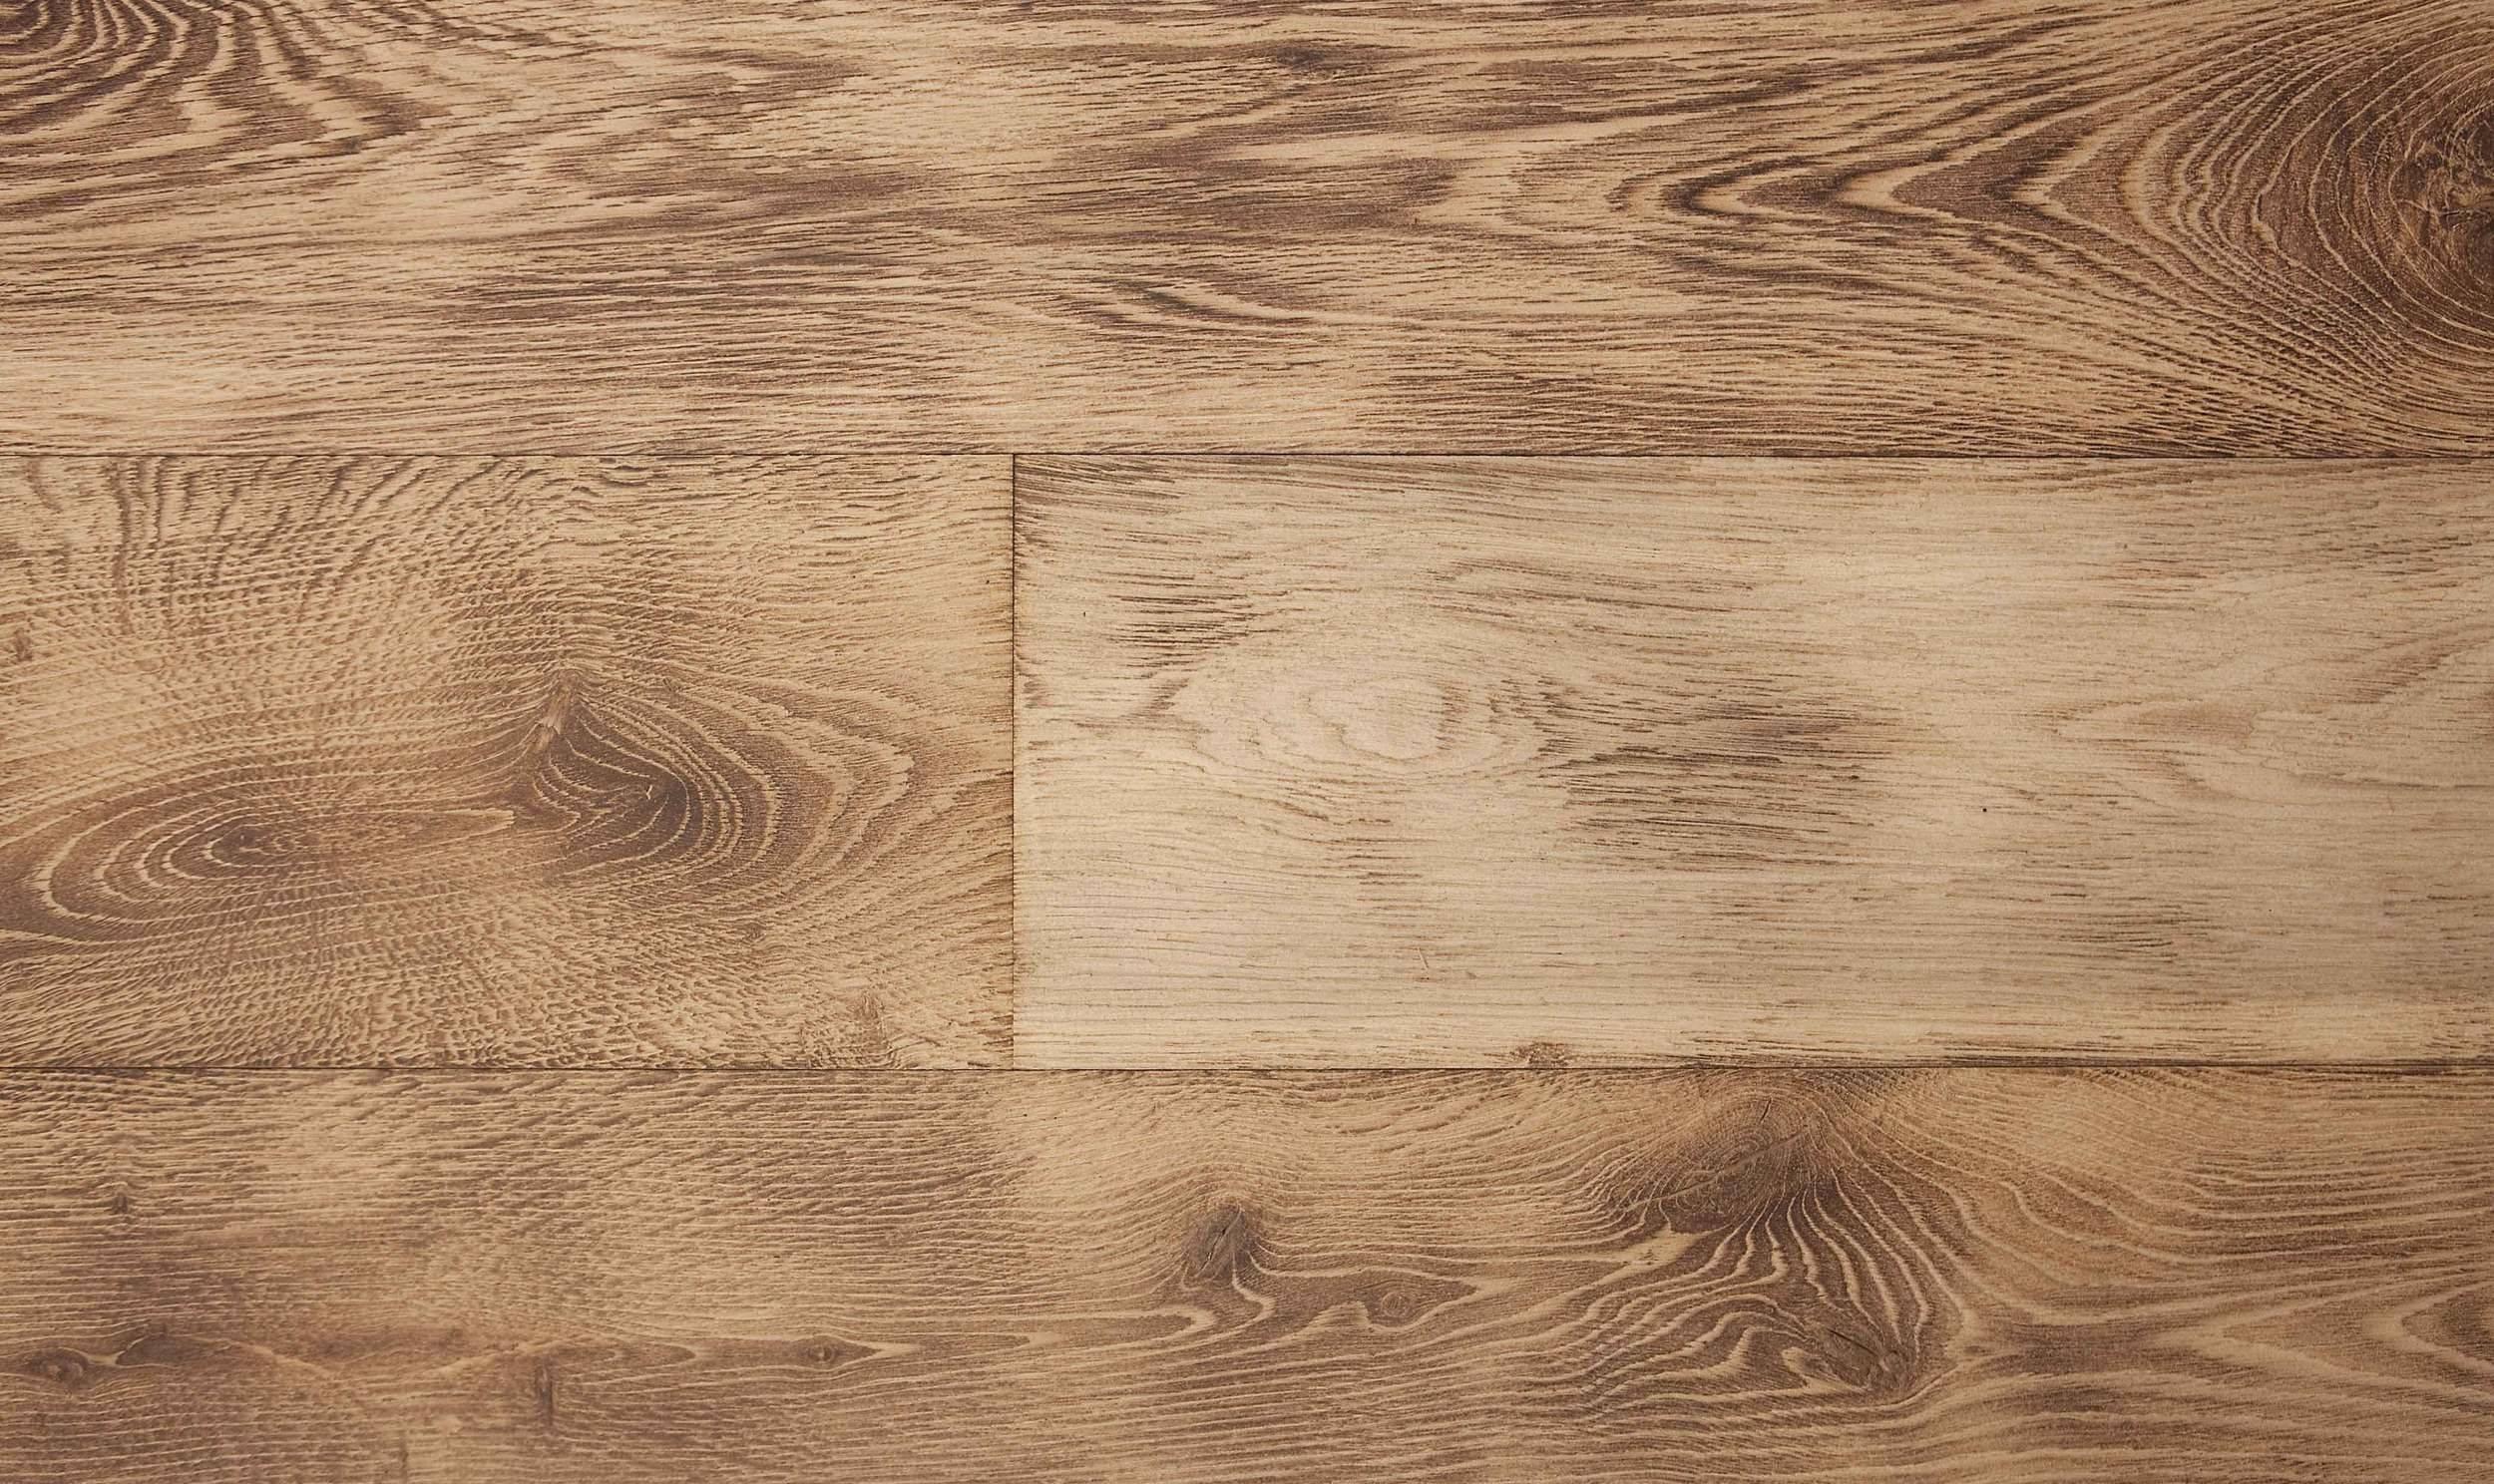 25 Wonderful wholesale Hardwood Flooring Nashville 2021 free download wholesale hardwood flooring nashville of results for discount hardwood flooring los angeles in discount hardwood flooring los angeles awesome of artisan collection fame hardwood los angeles